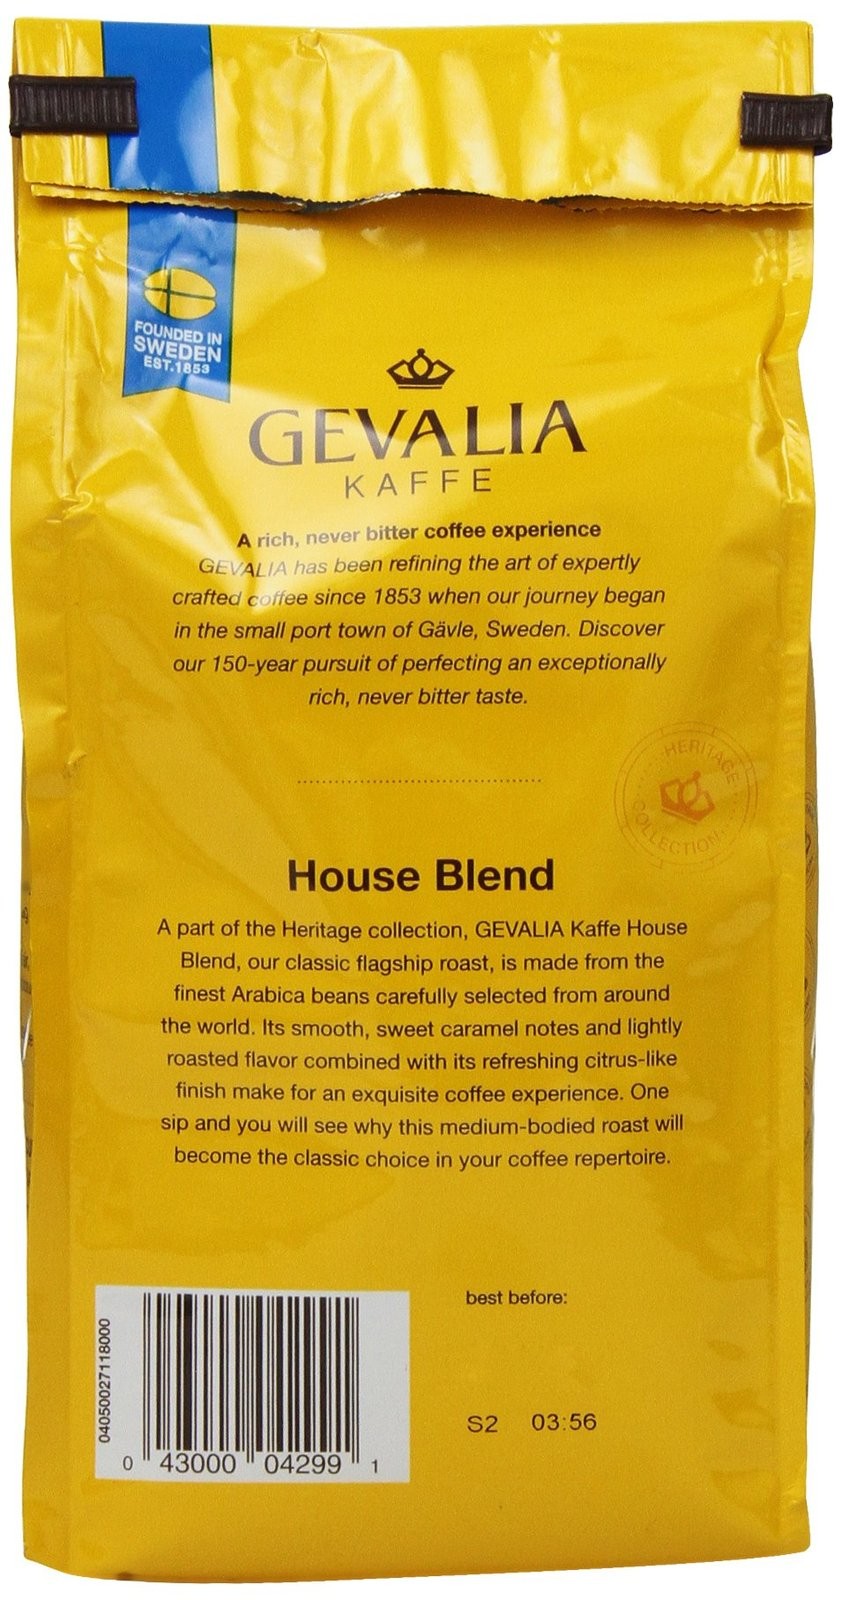 Gevalia, Ground Coffee, House Blend, 12oz Bag (Pack of 2)